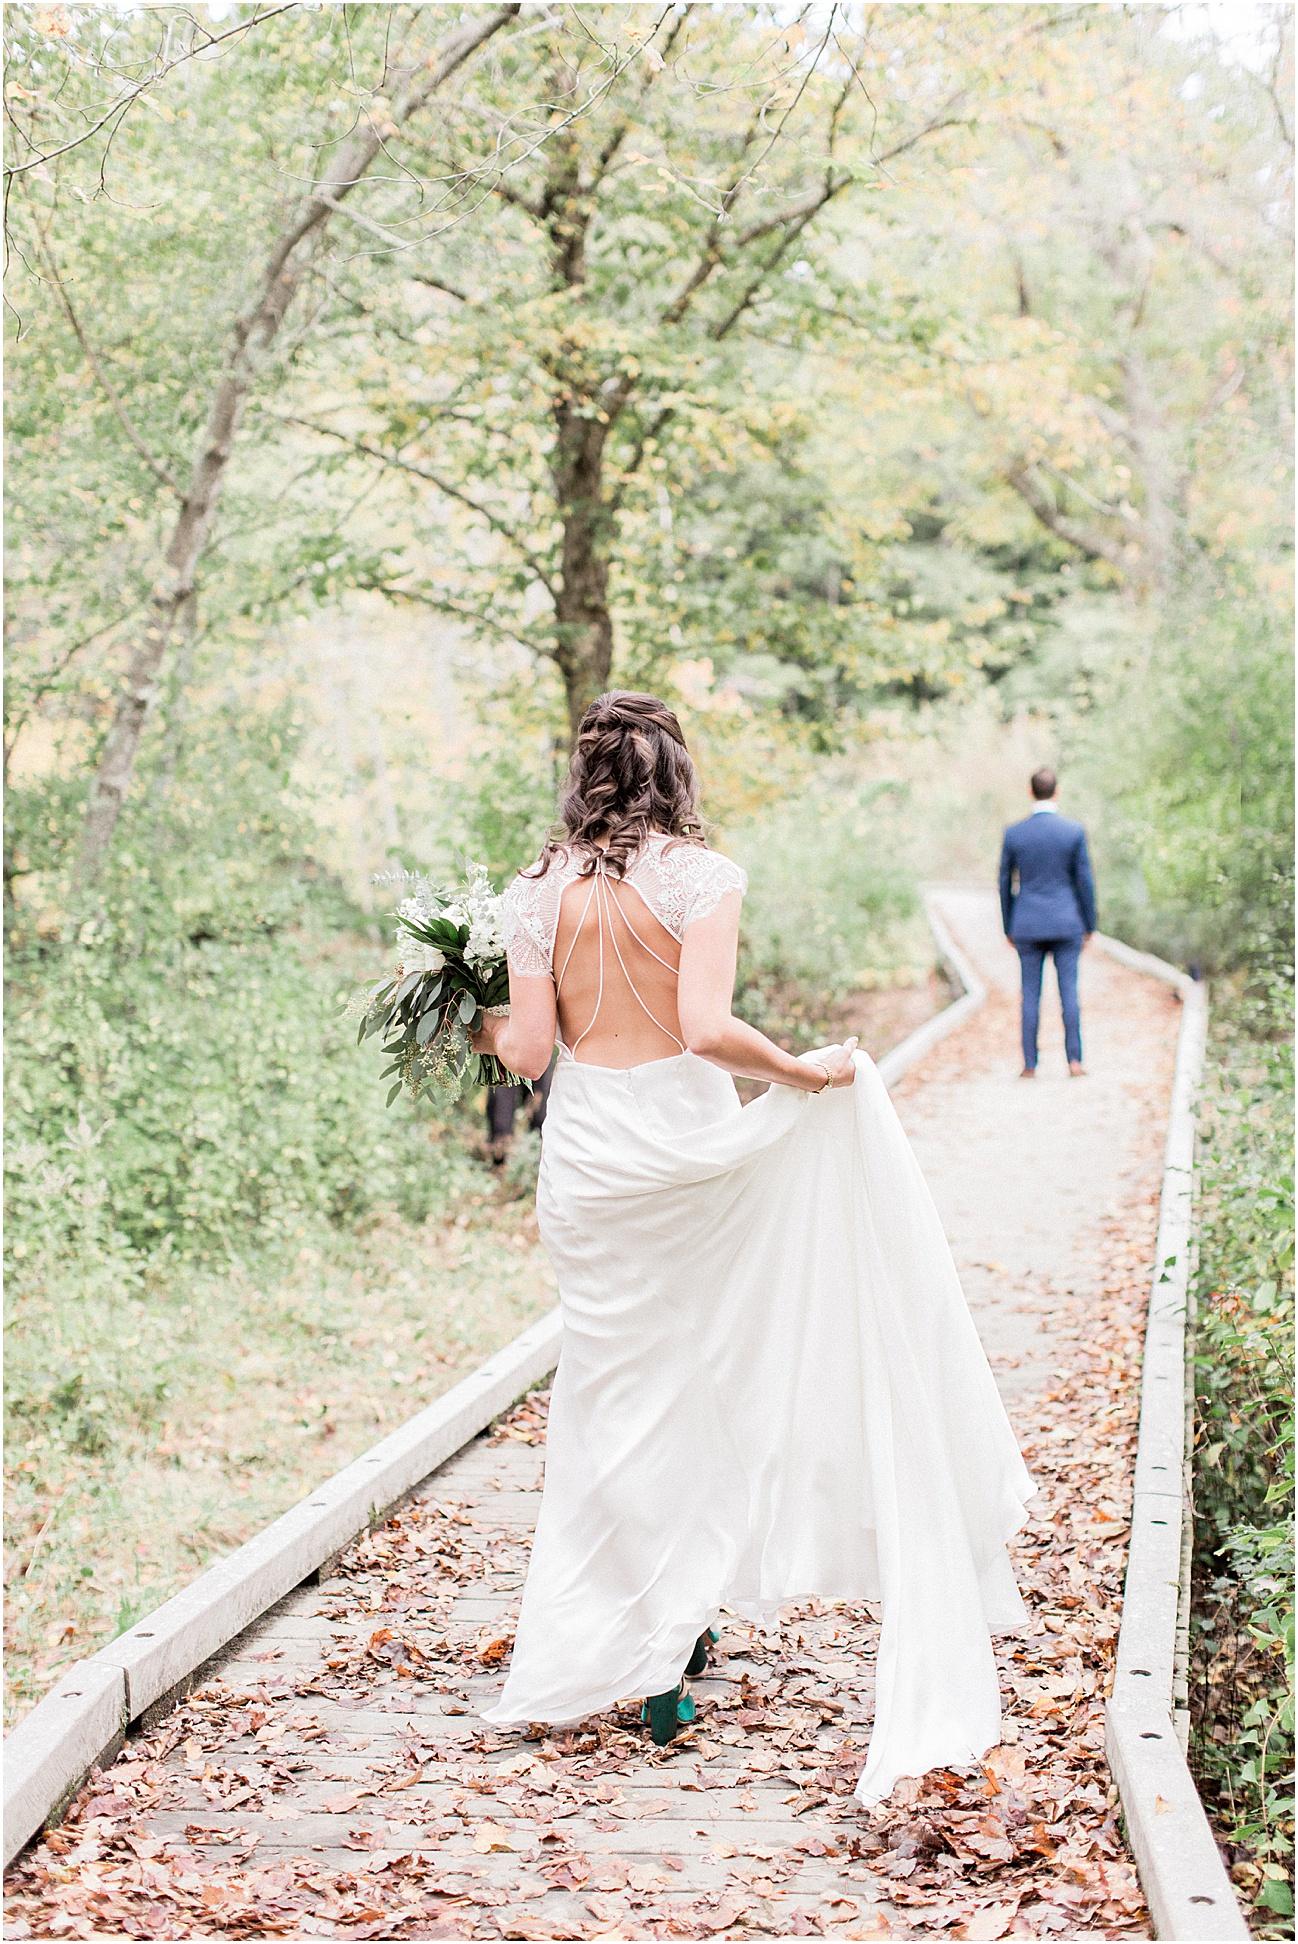 jenna_mike_willowdale_estate_topsfield_neutral_whites_greens_fall_cape_cod_boston_wedding_photographer_meredith_jane_photography_photo_1473.jpg